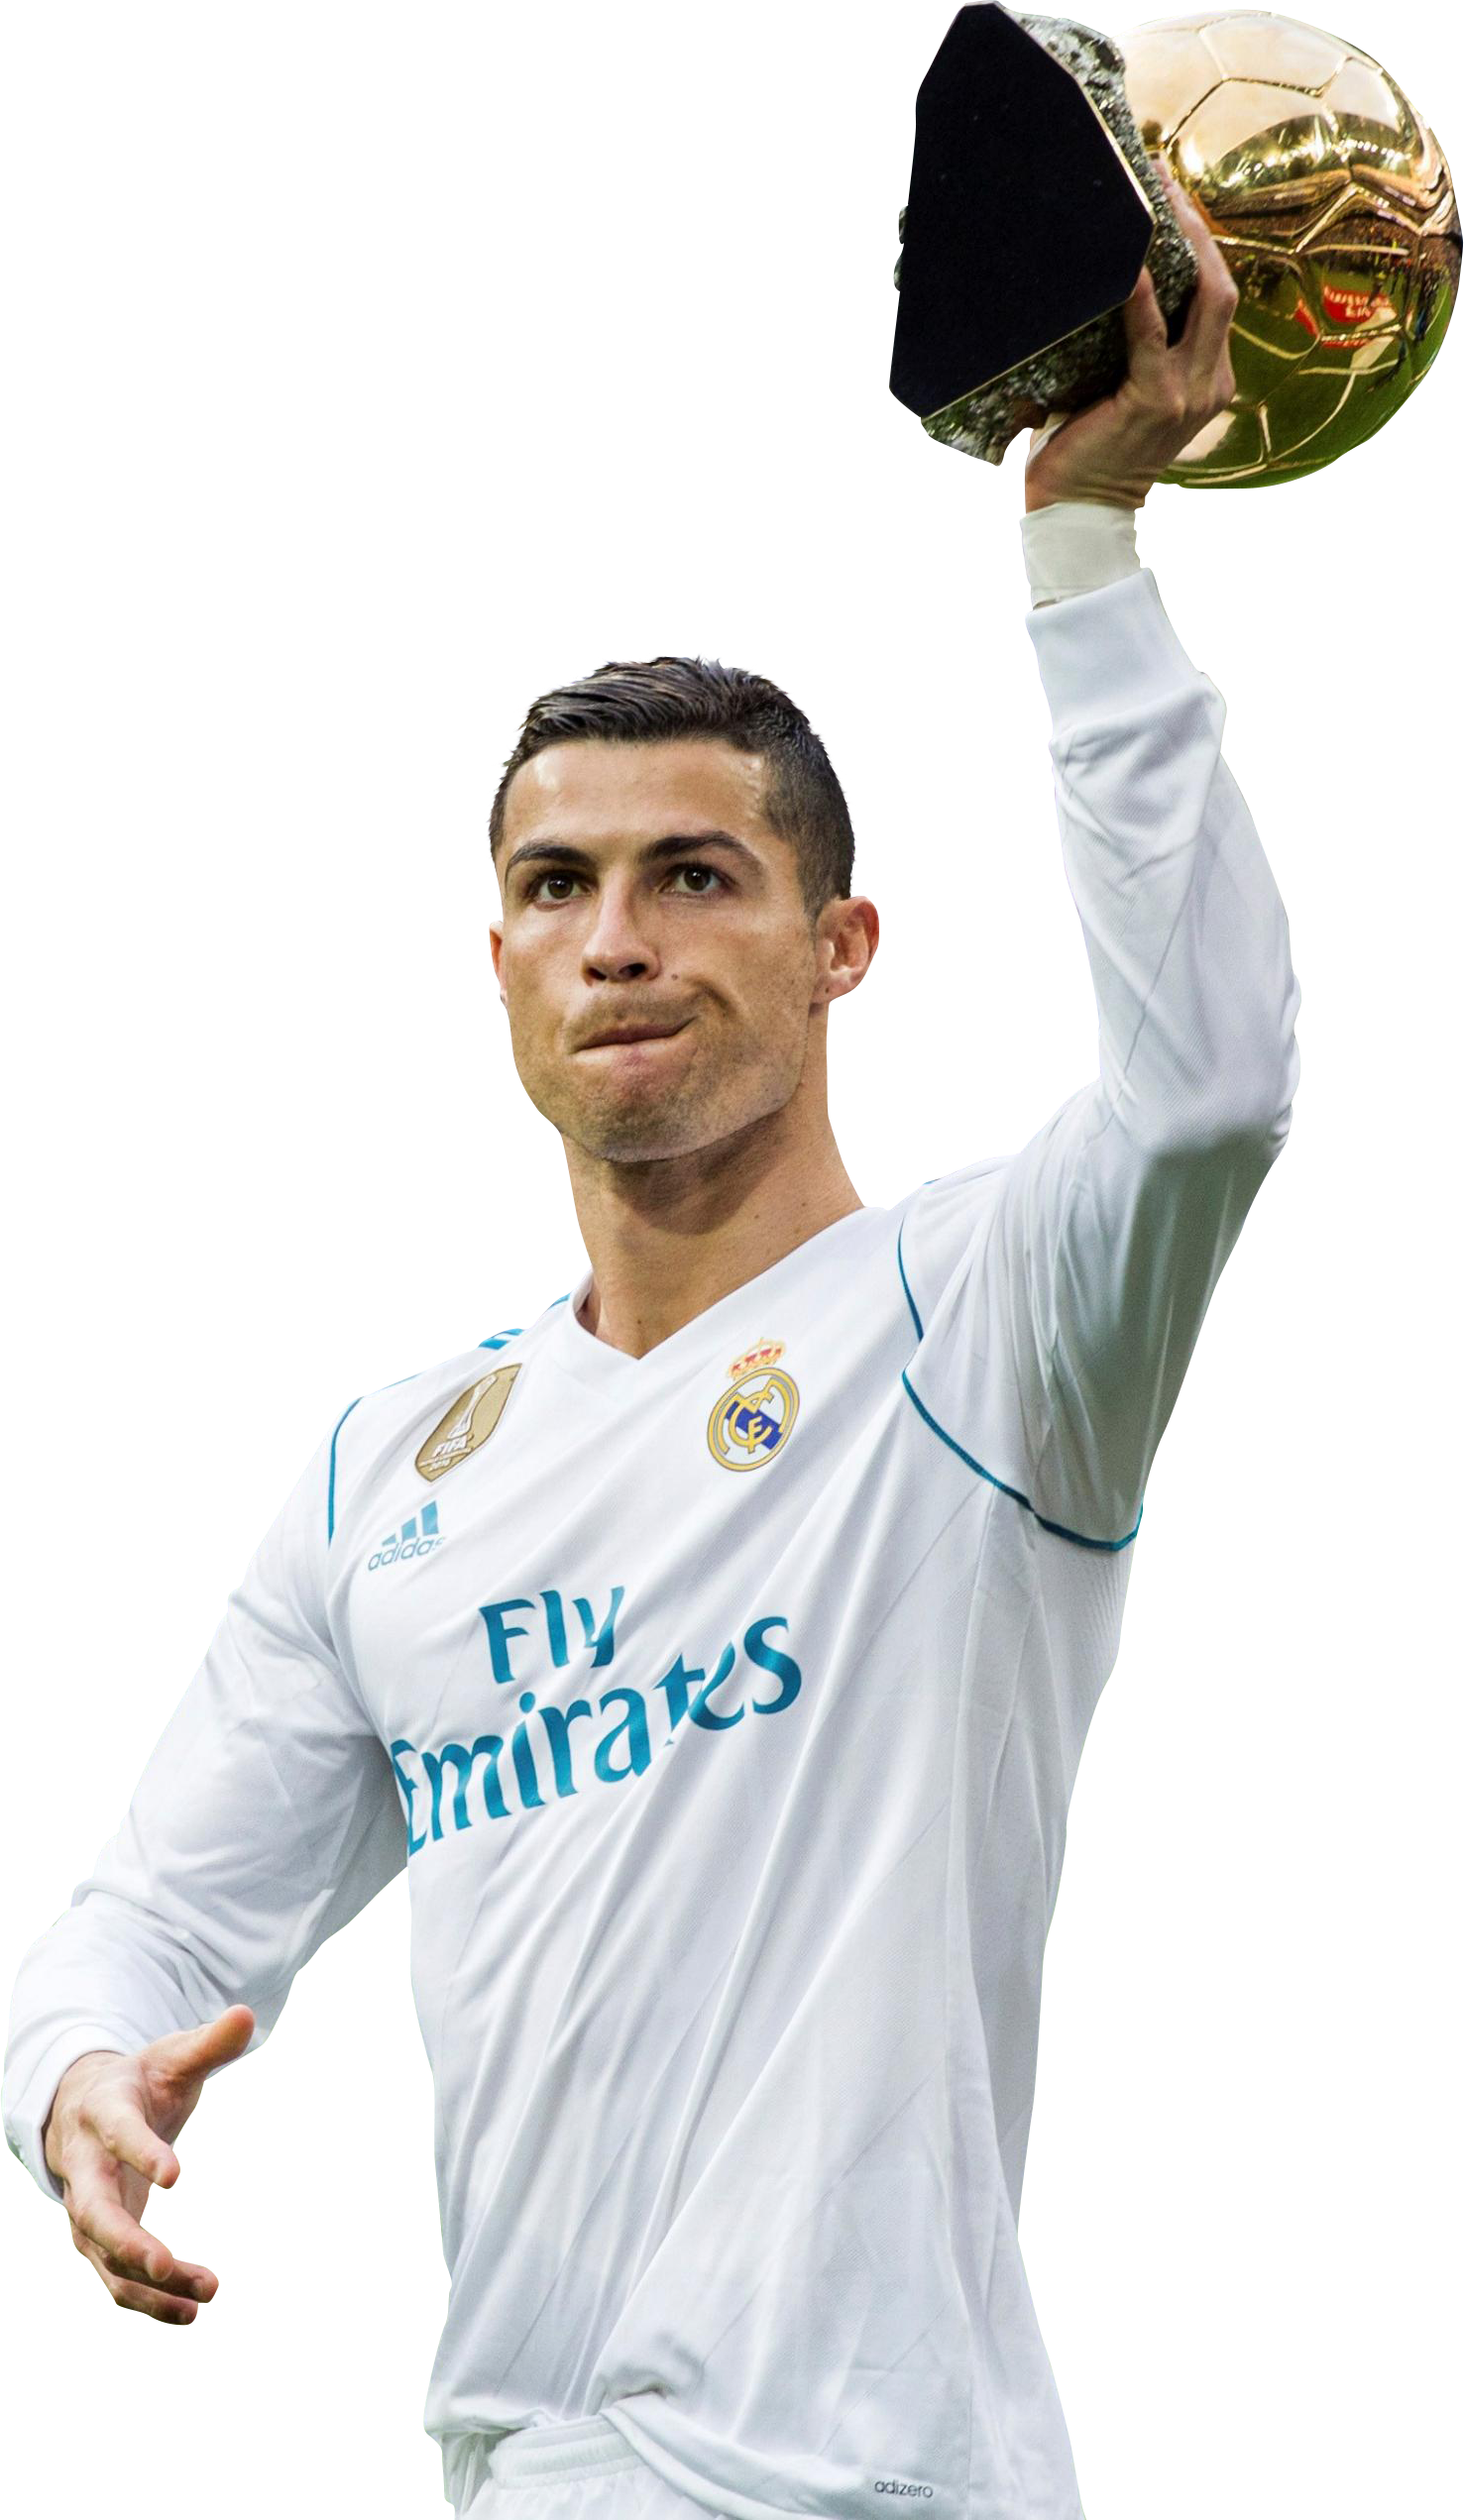 Cristiano Ronaldo Football Render 42570 Footyrenders